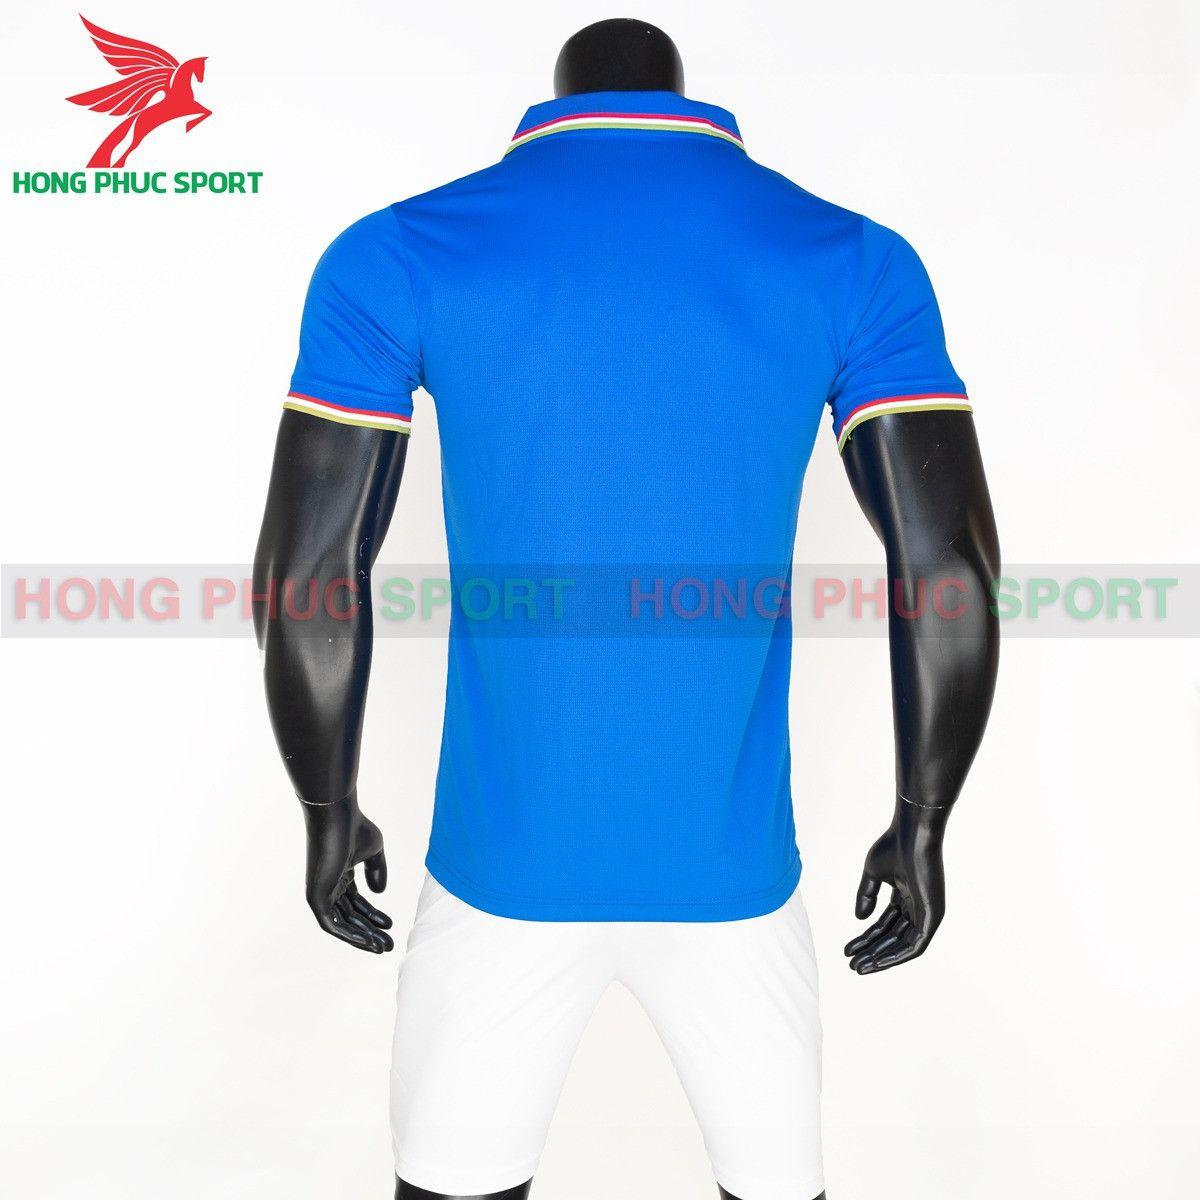 https://cdn.hongphucsport.com/unsafe/s4.shopbay.vn/files/285/ao-dau-tuyen-italy-2021-san-nha-thailand-7-614ae2faa4315.jpg